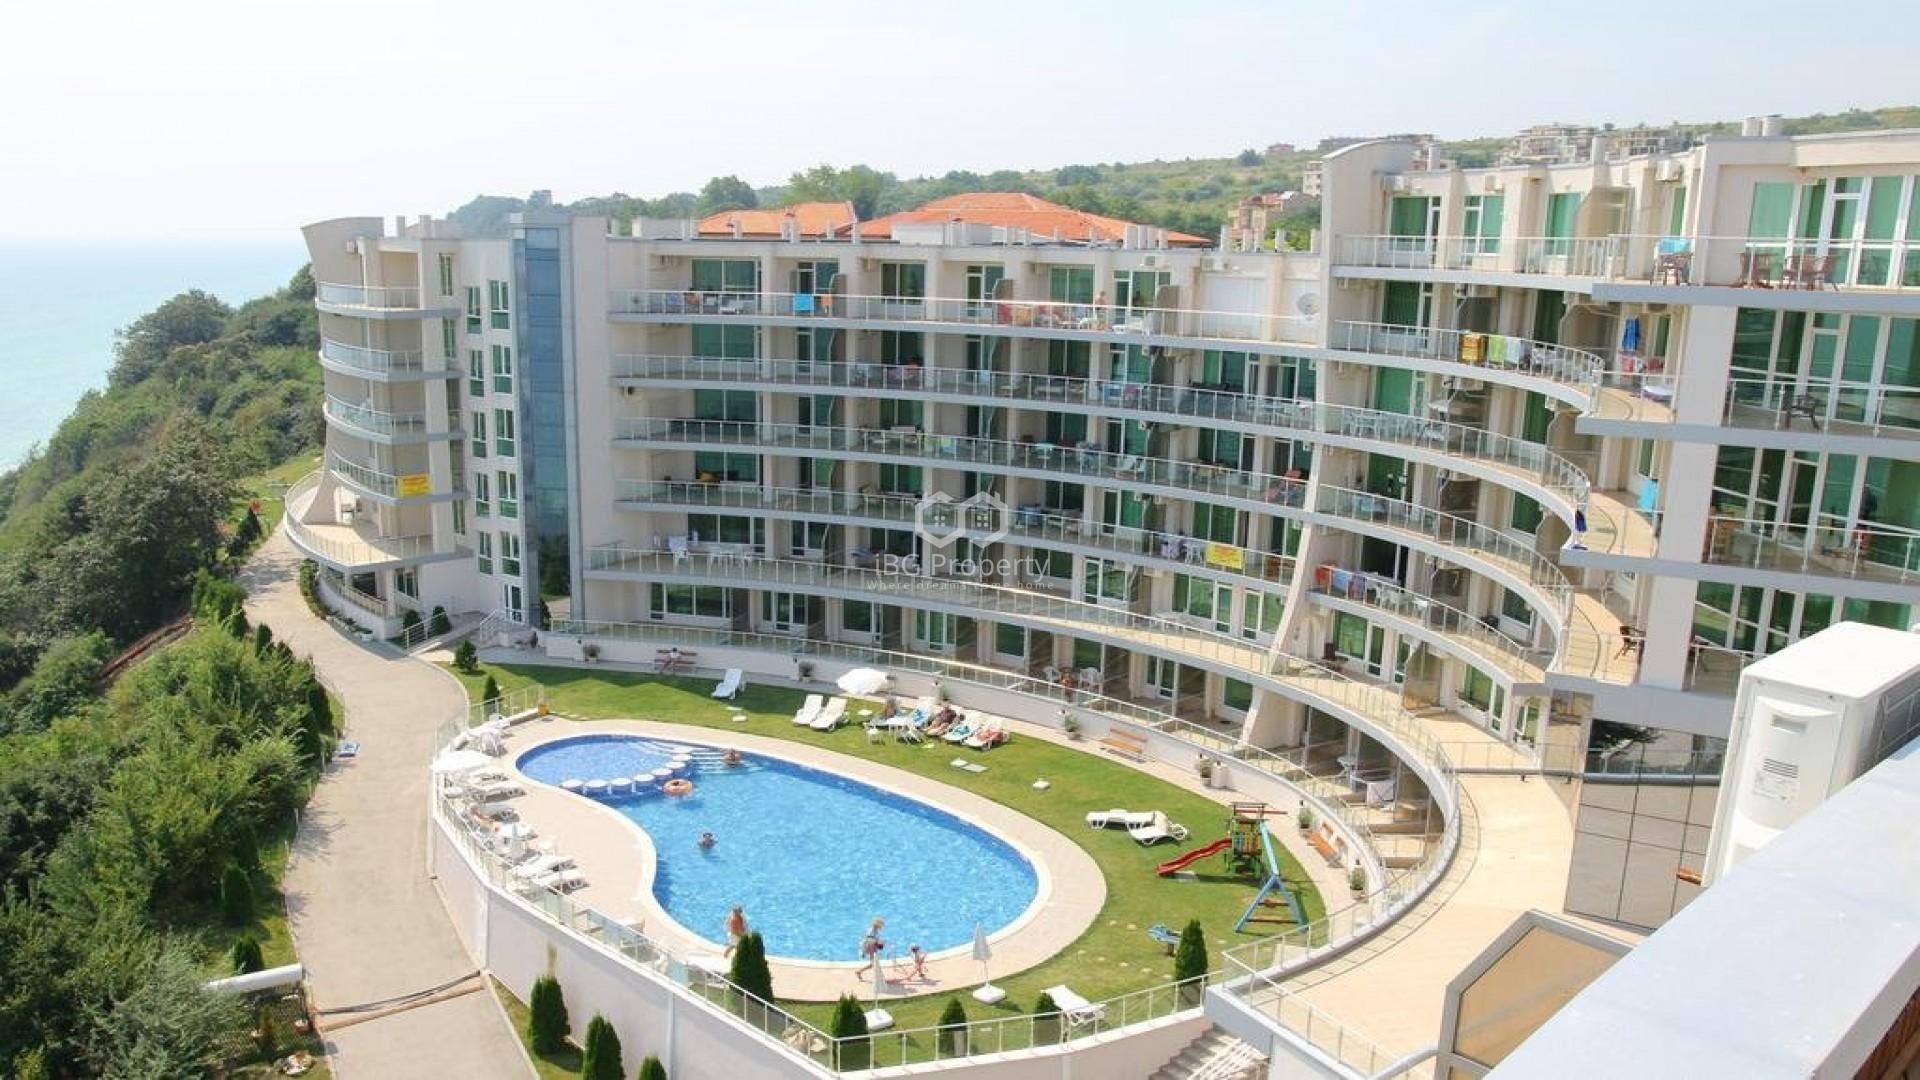 Однокомнатная квартира Бяла 79,48  m2